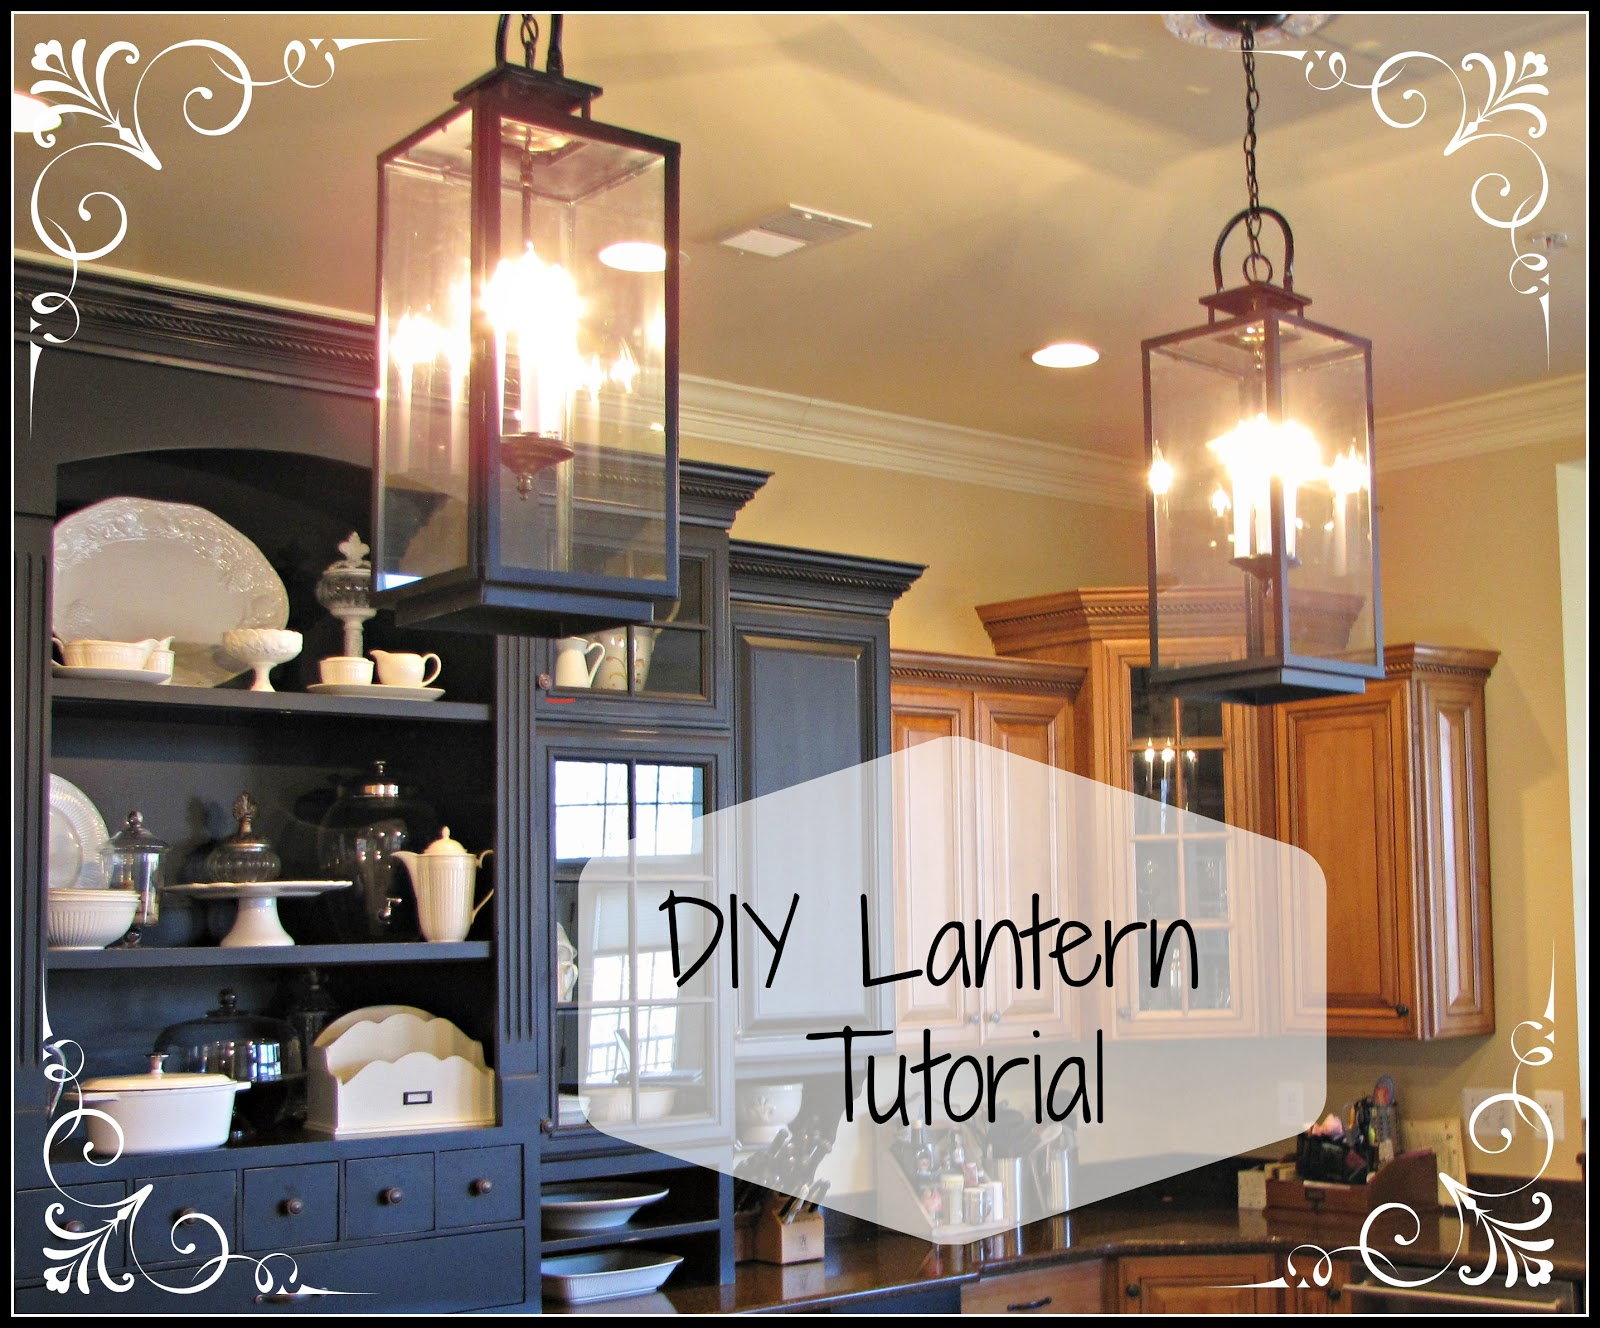 diy lantern tutorial lantern kitchen lighting Saturday February 23